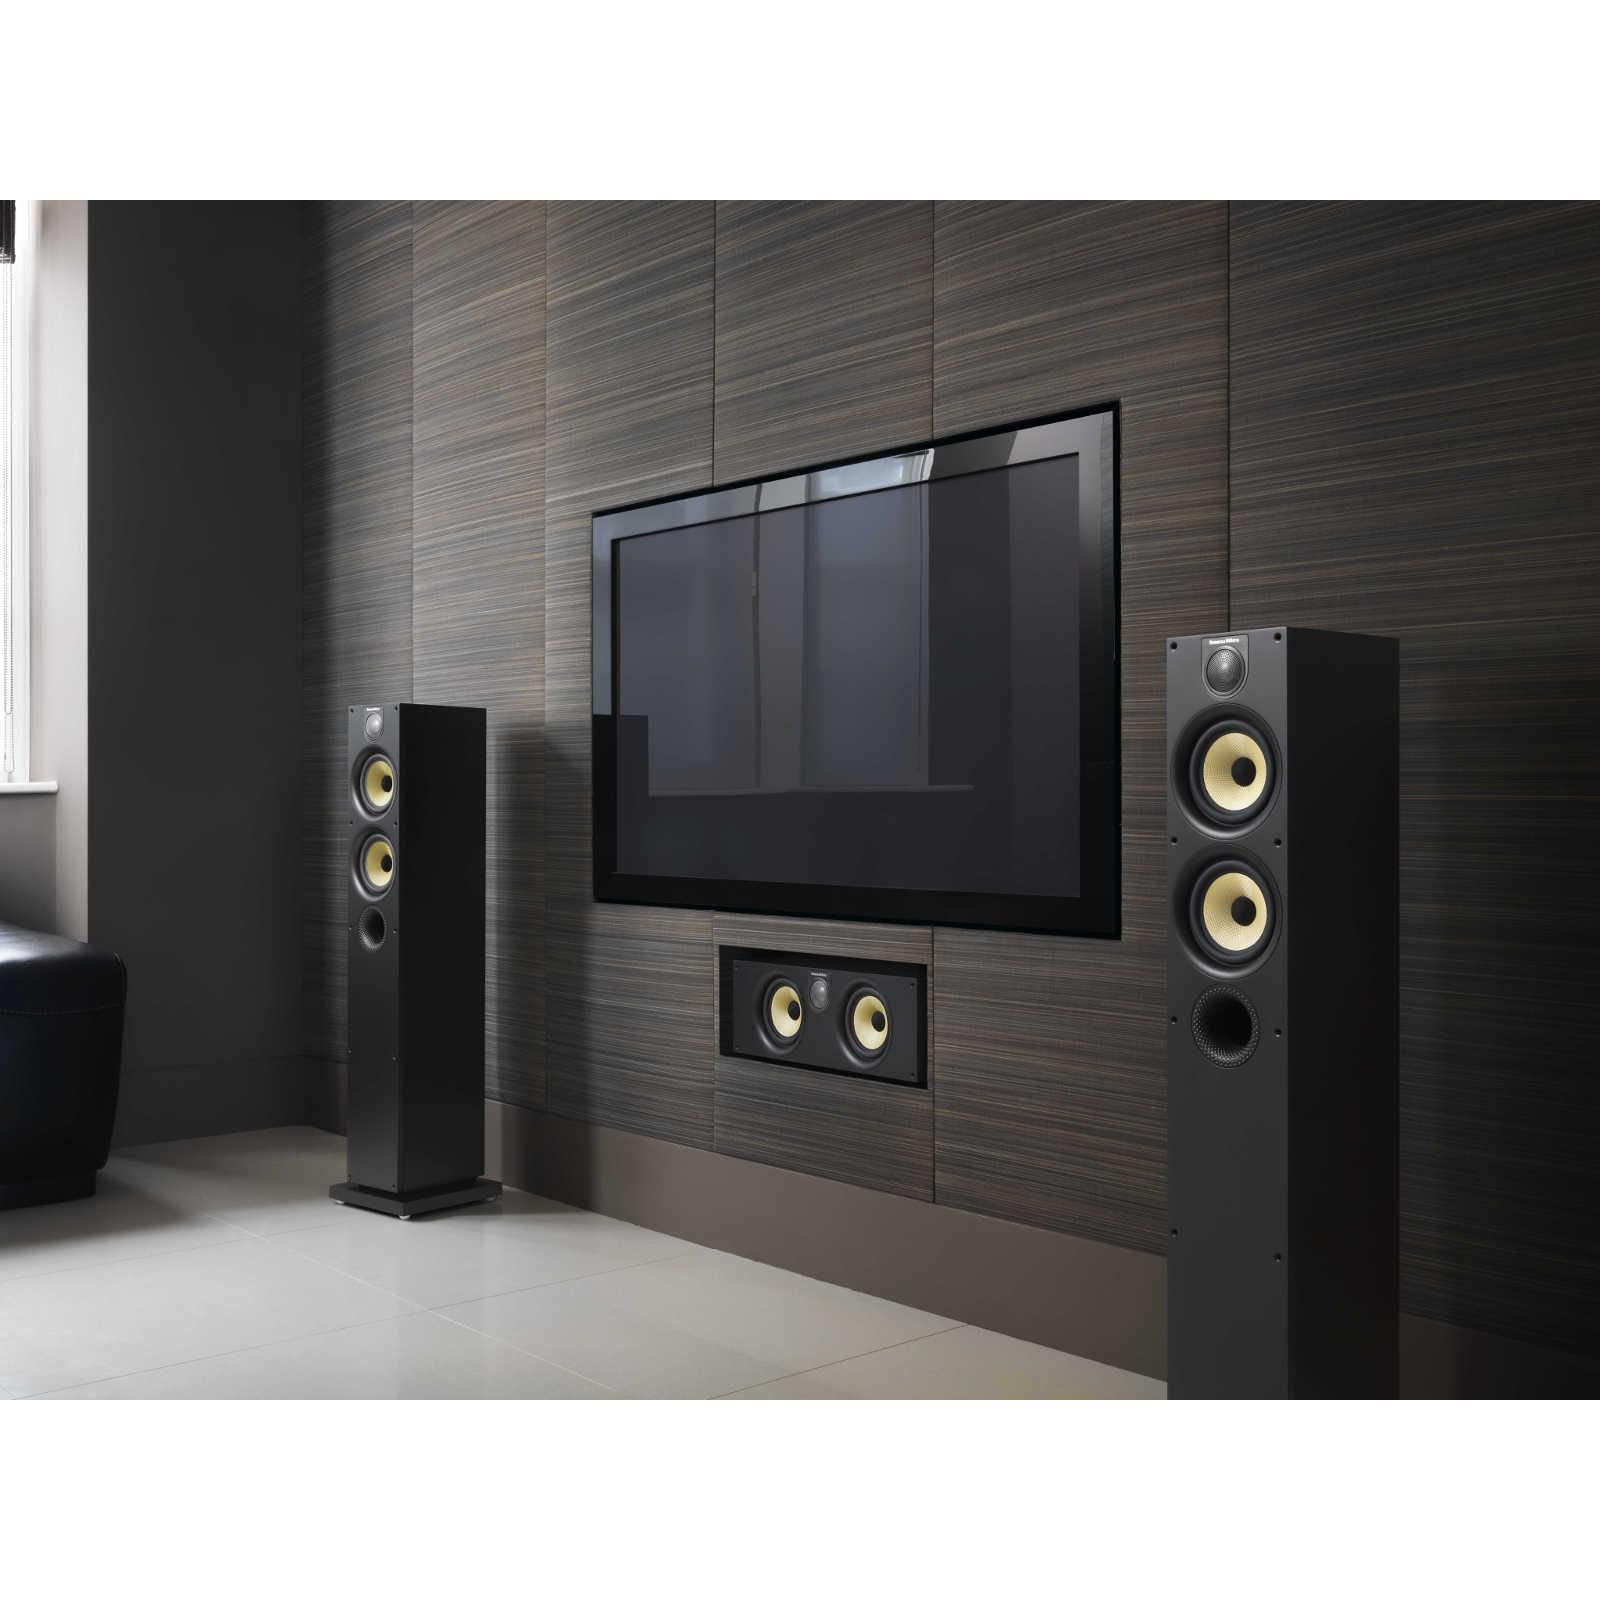 b w 684 s2 black ash enceintes hifi bowers wilkins sur. Black Bedroom Furniture Sets. Home Design Ideas